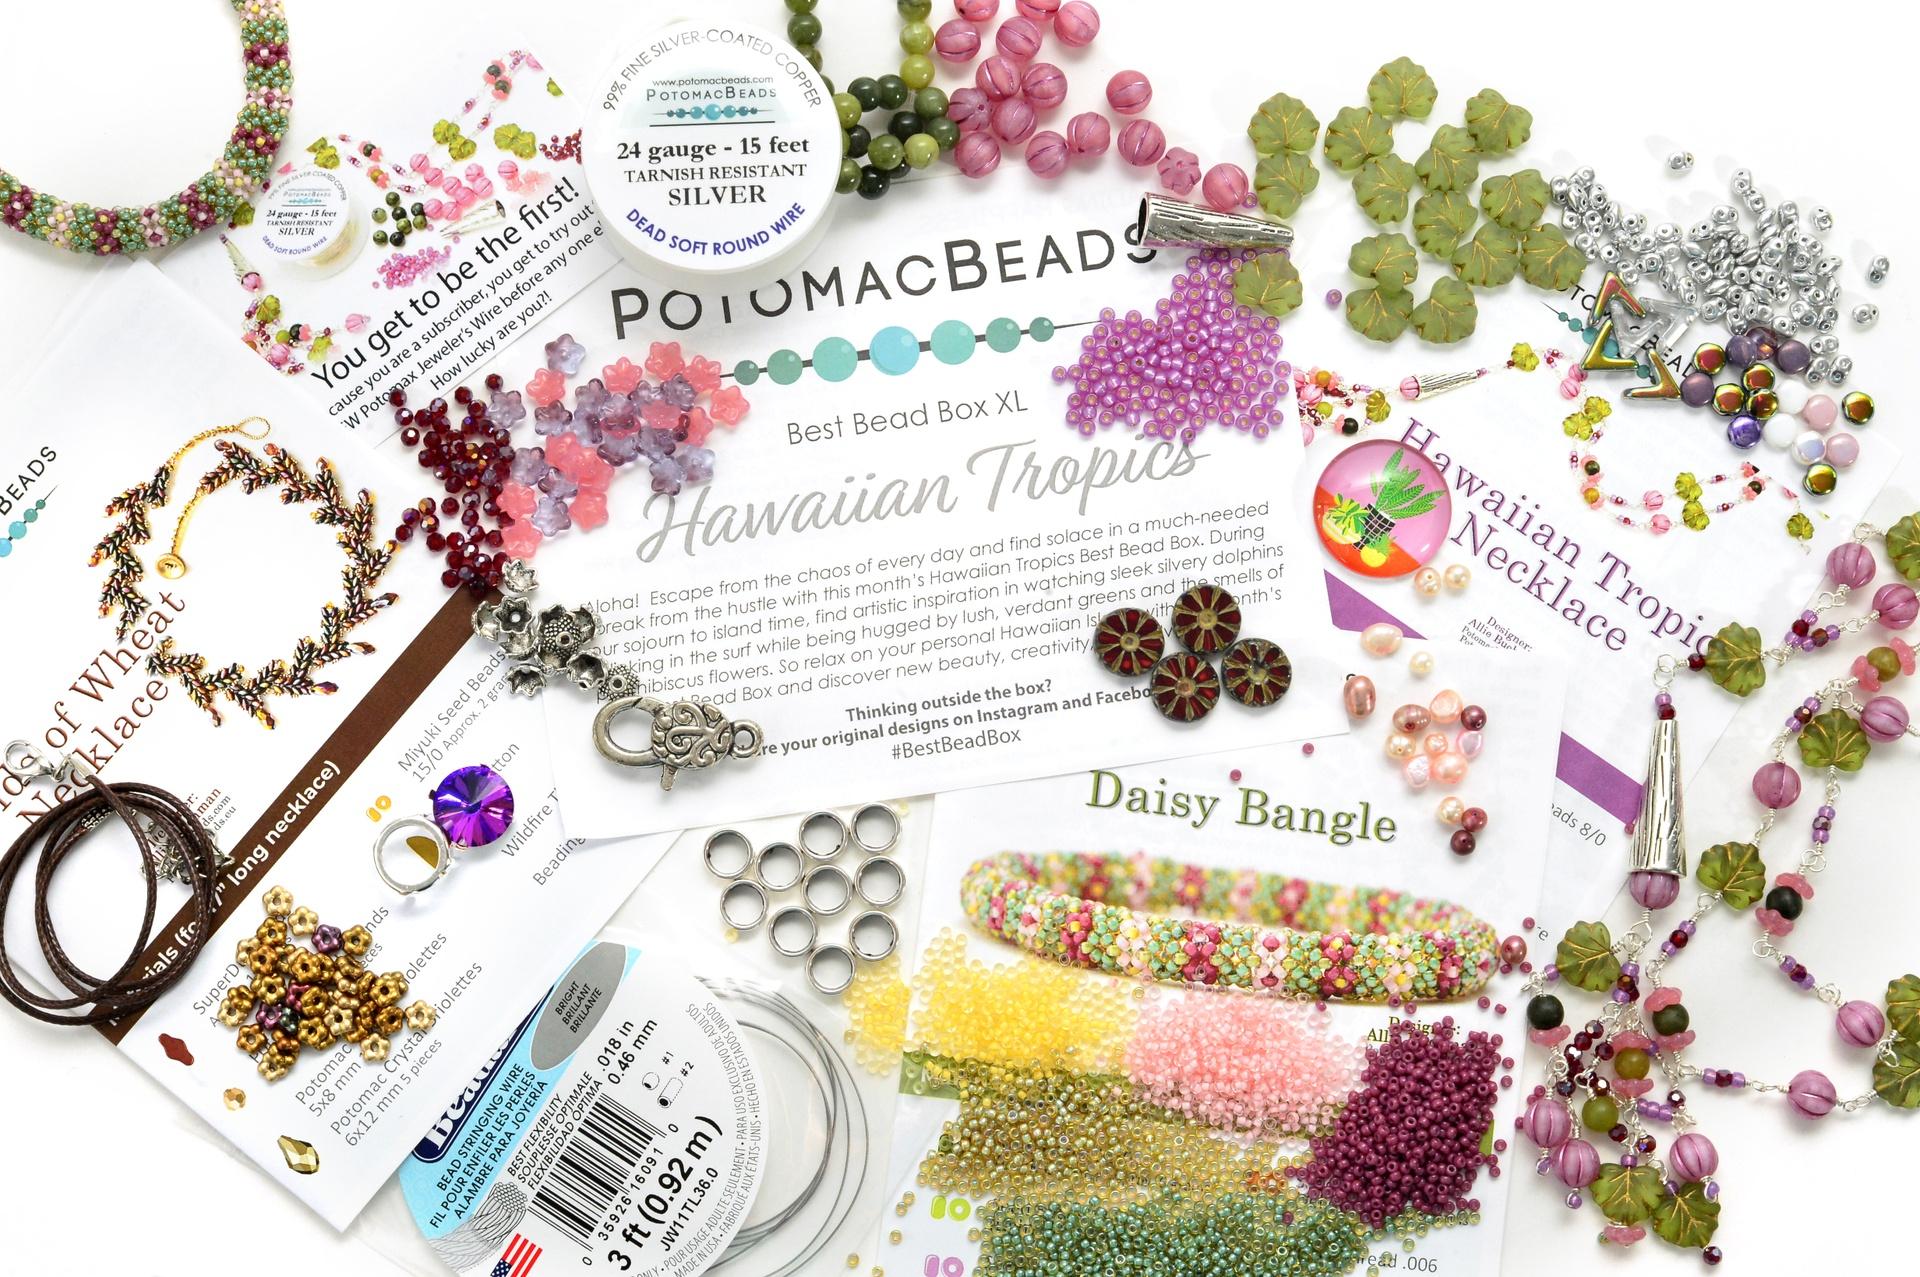 Subscription Inspiration / June Best Bead Box XL 2021